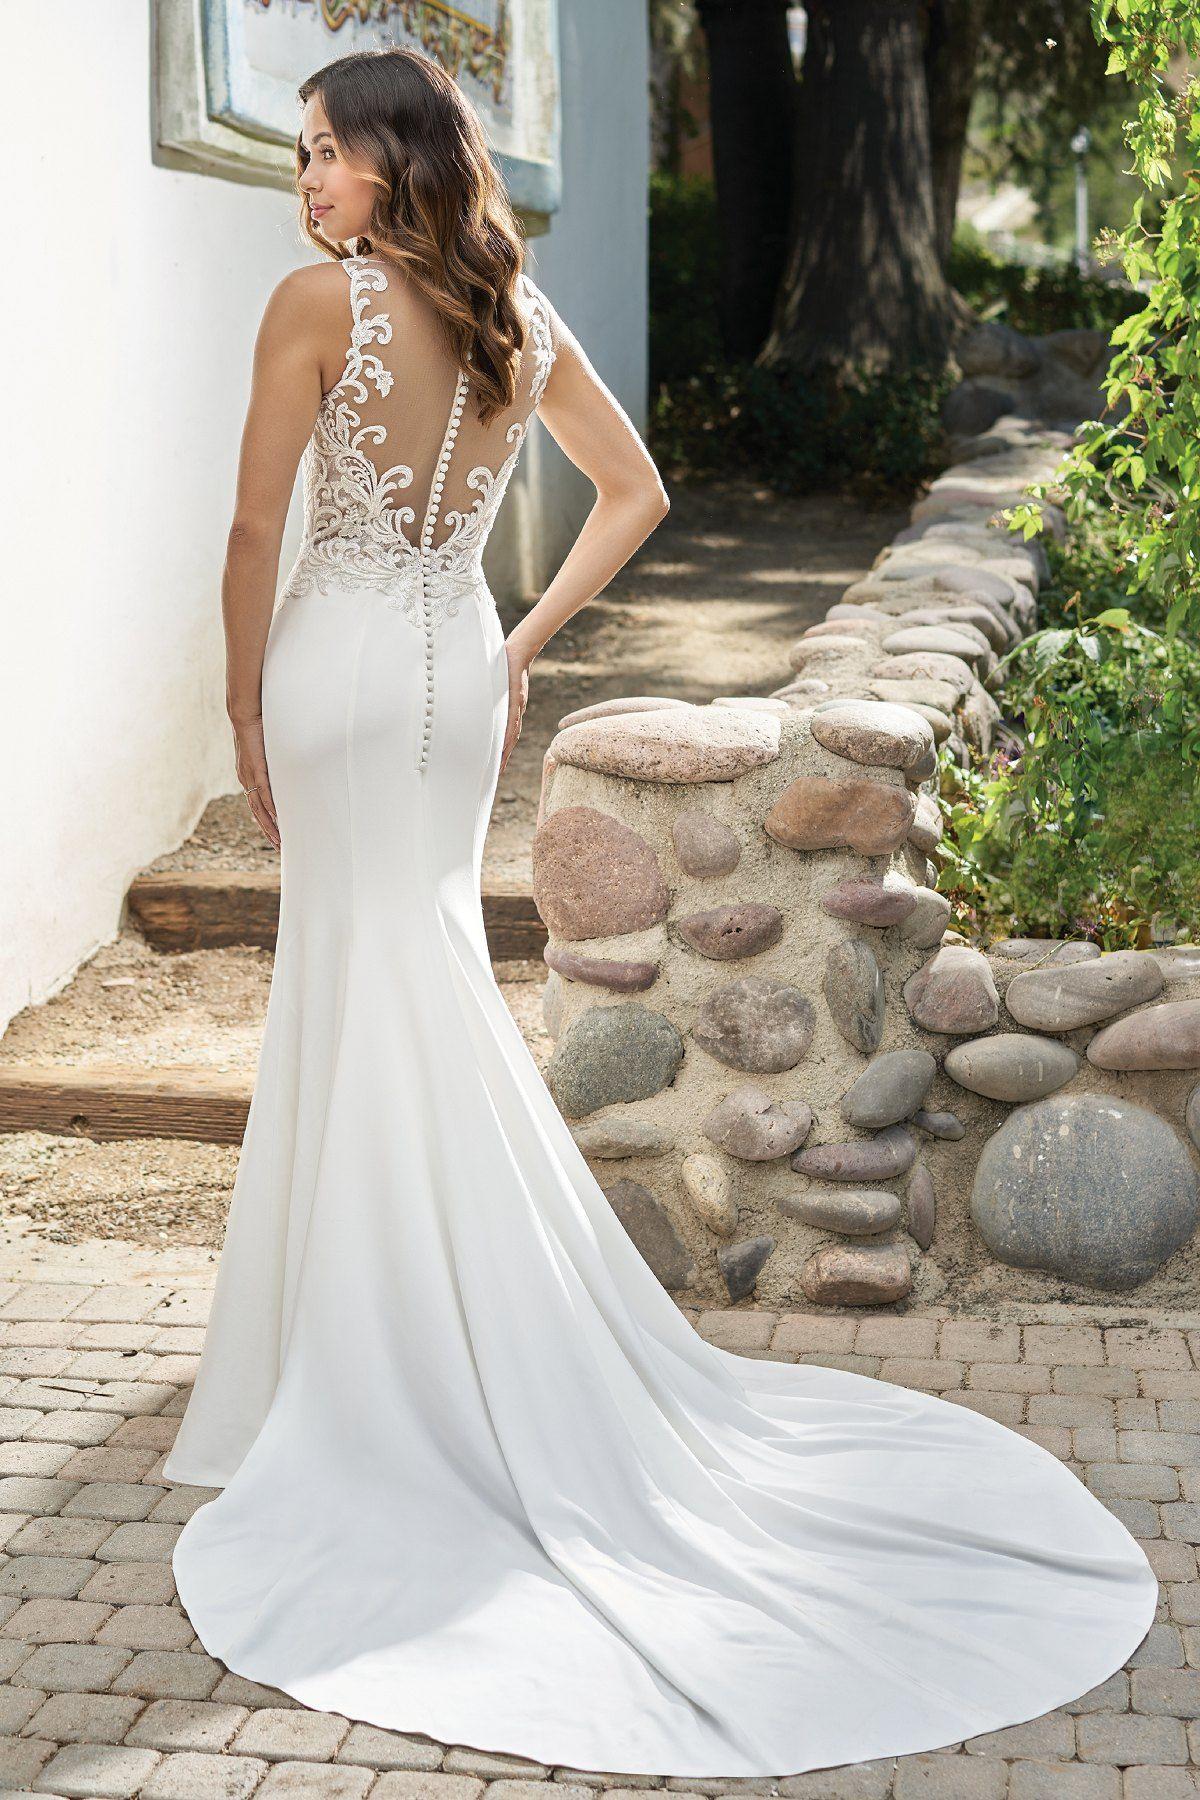 45+ Stretchy wedding dress material info